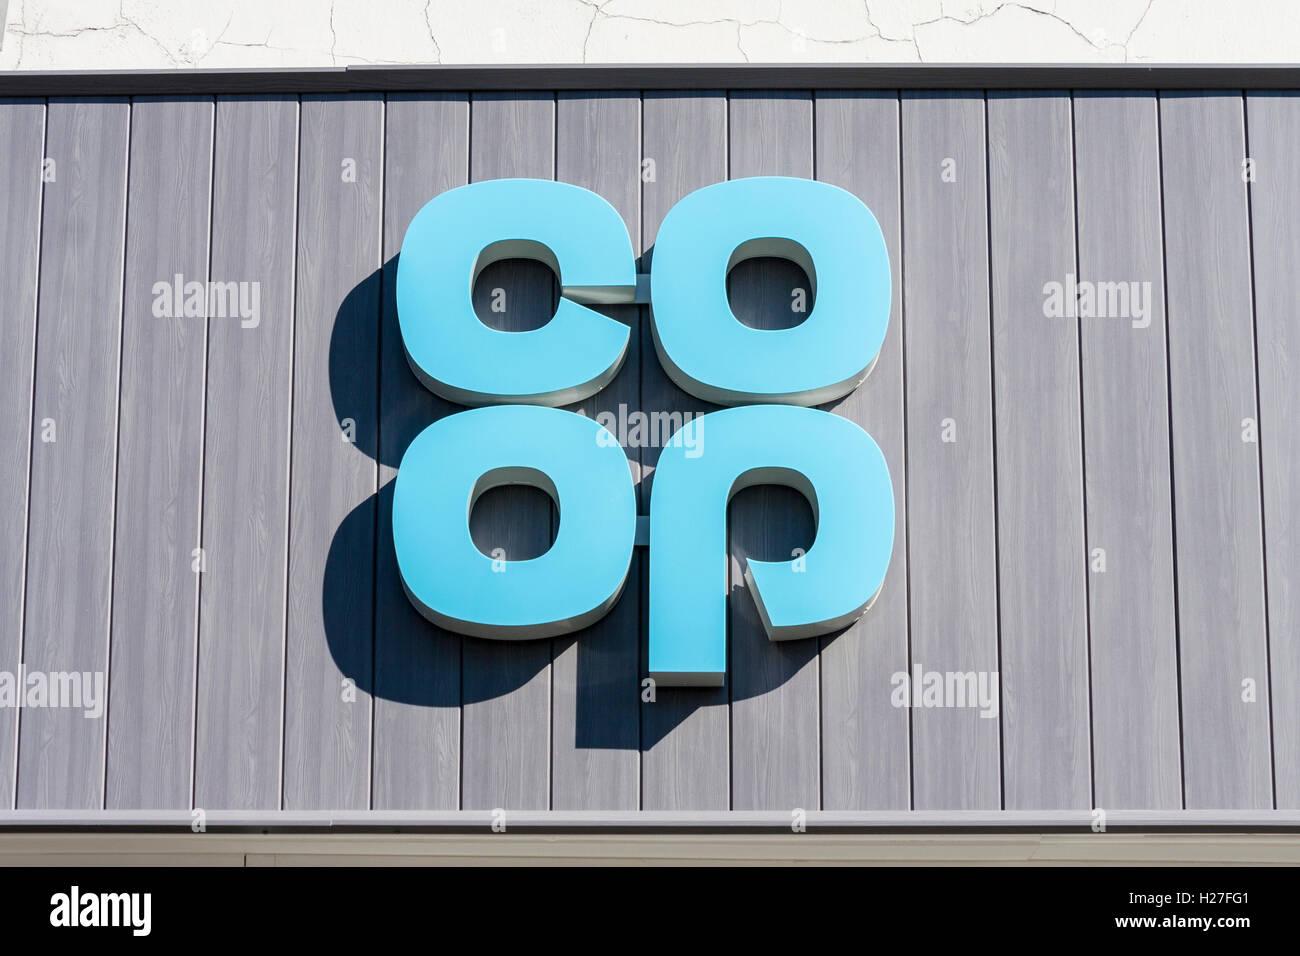 New Co-operative logo above store following retro 1960s rebrand in 2016. Stock Photo